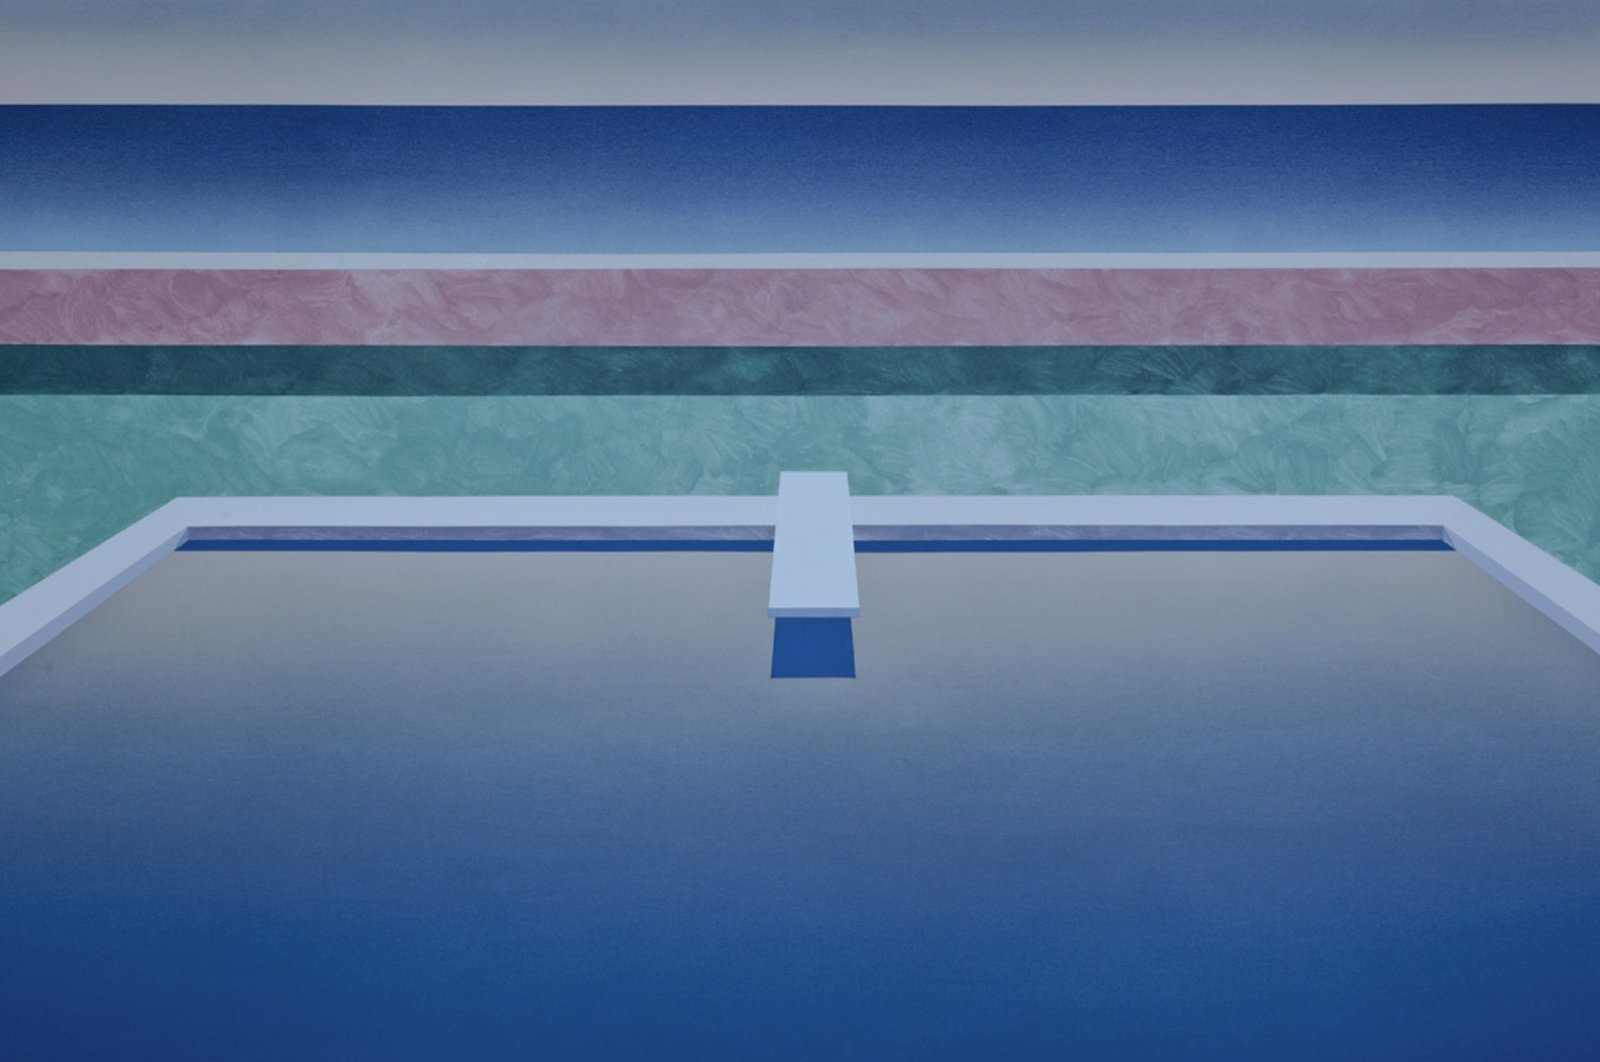 "Ufuk Yılmaz,""Anlık 4,"" 2020,acyrlic on canvas, 100 by 165 centimeters. (Courtesy of Vision Art Platform)"